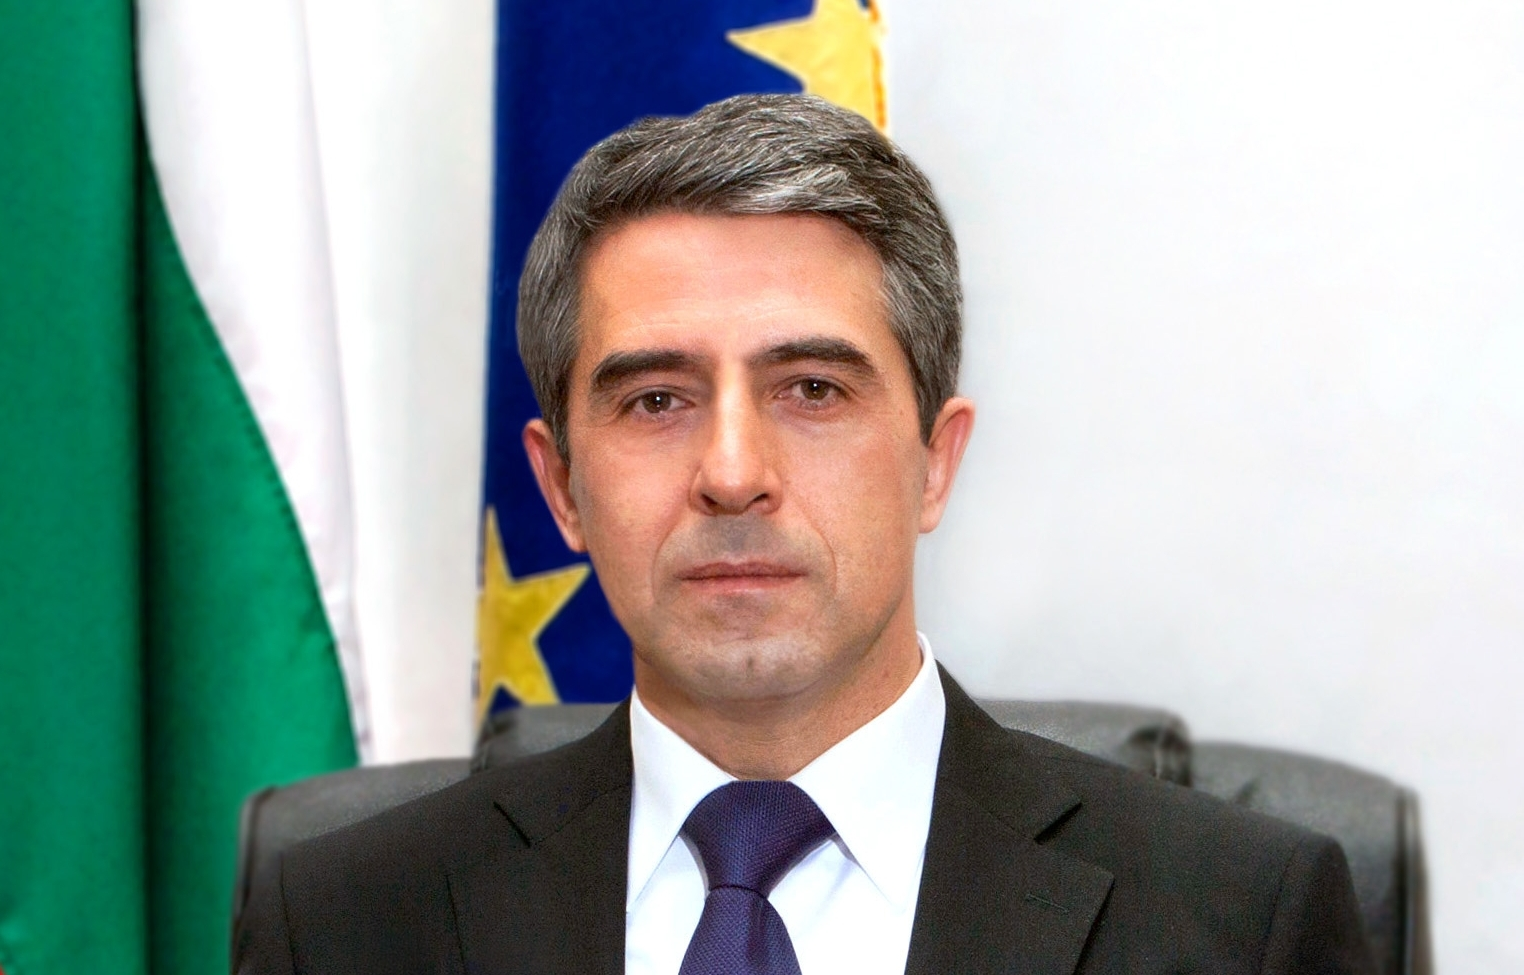 Bulgarian President Plevneliev denounces smear campaign against him